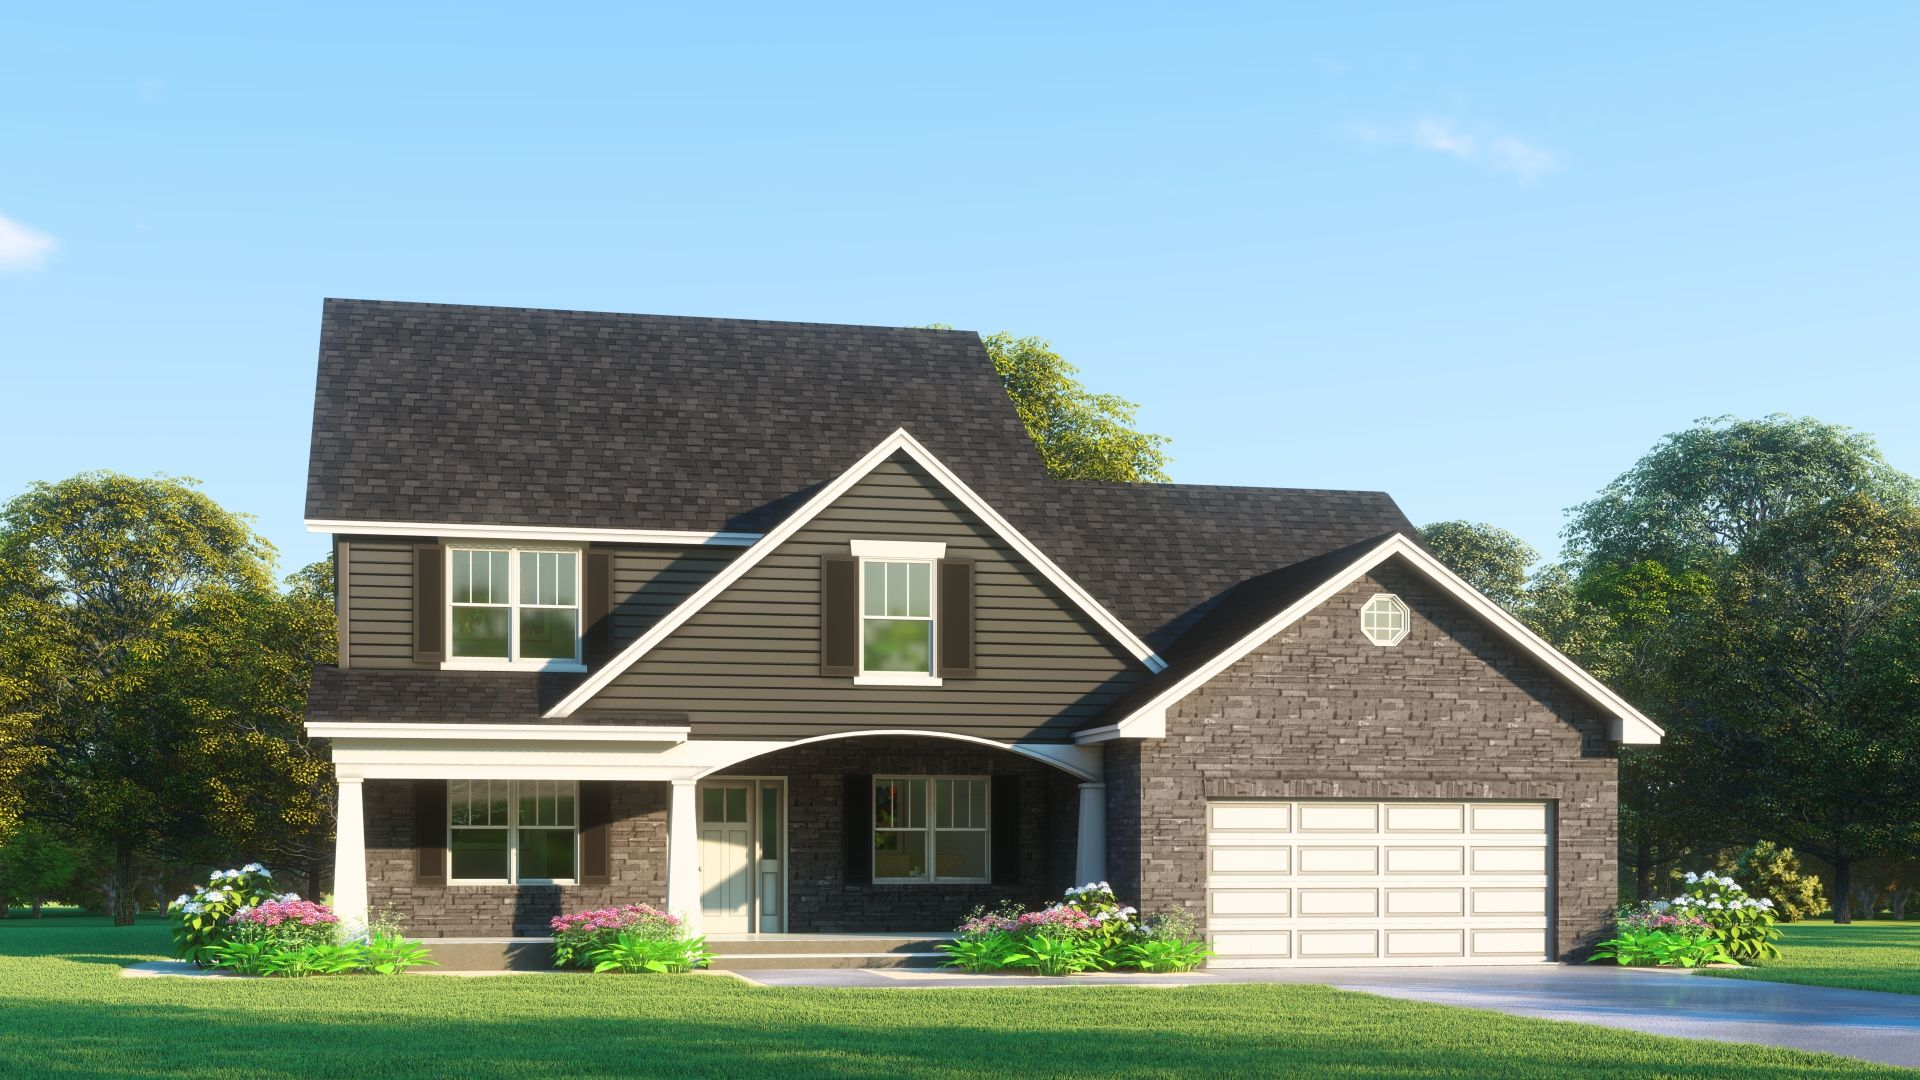 New Homes St. Louis | Sawgrass